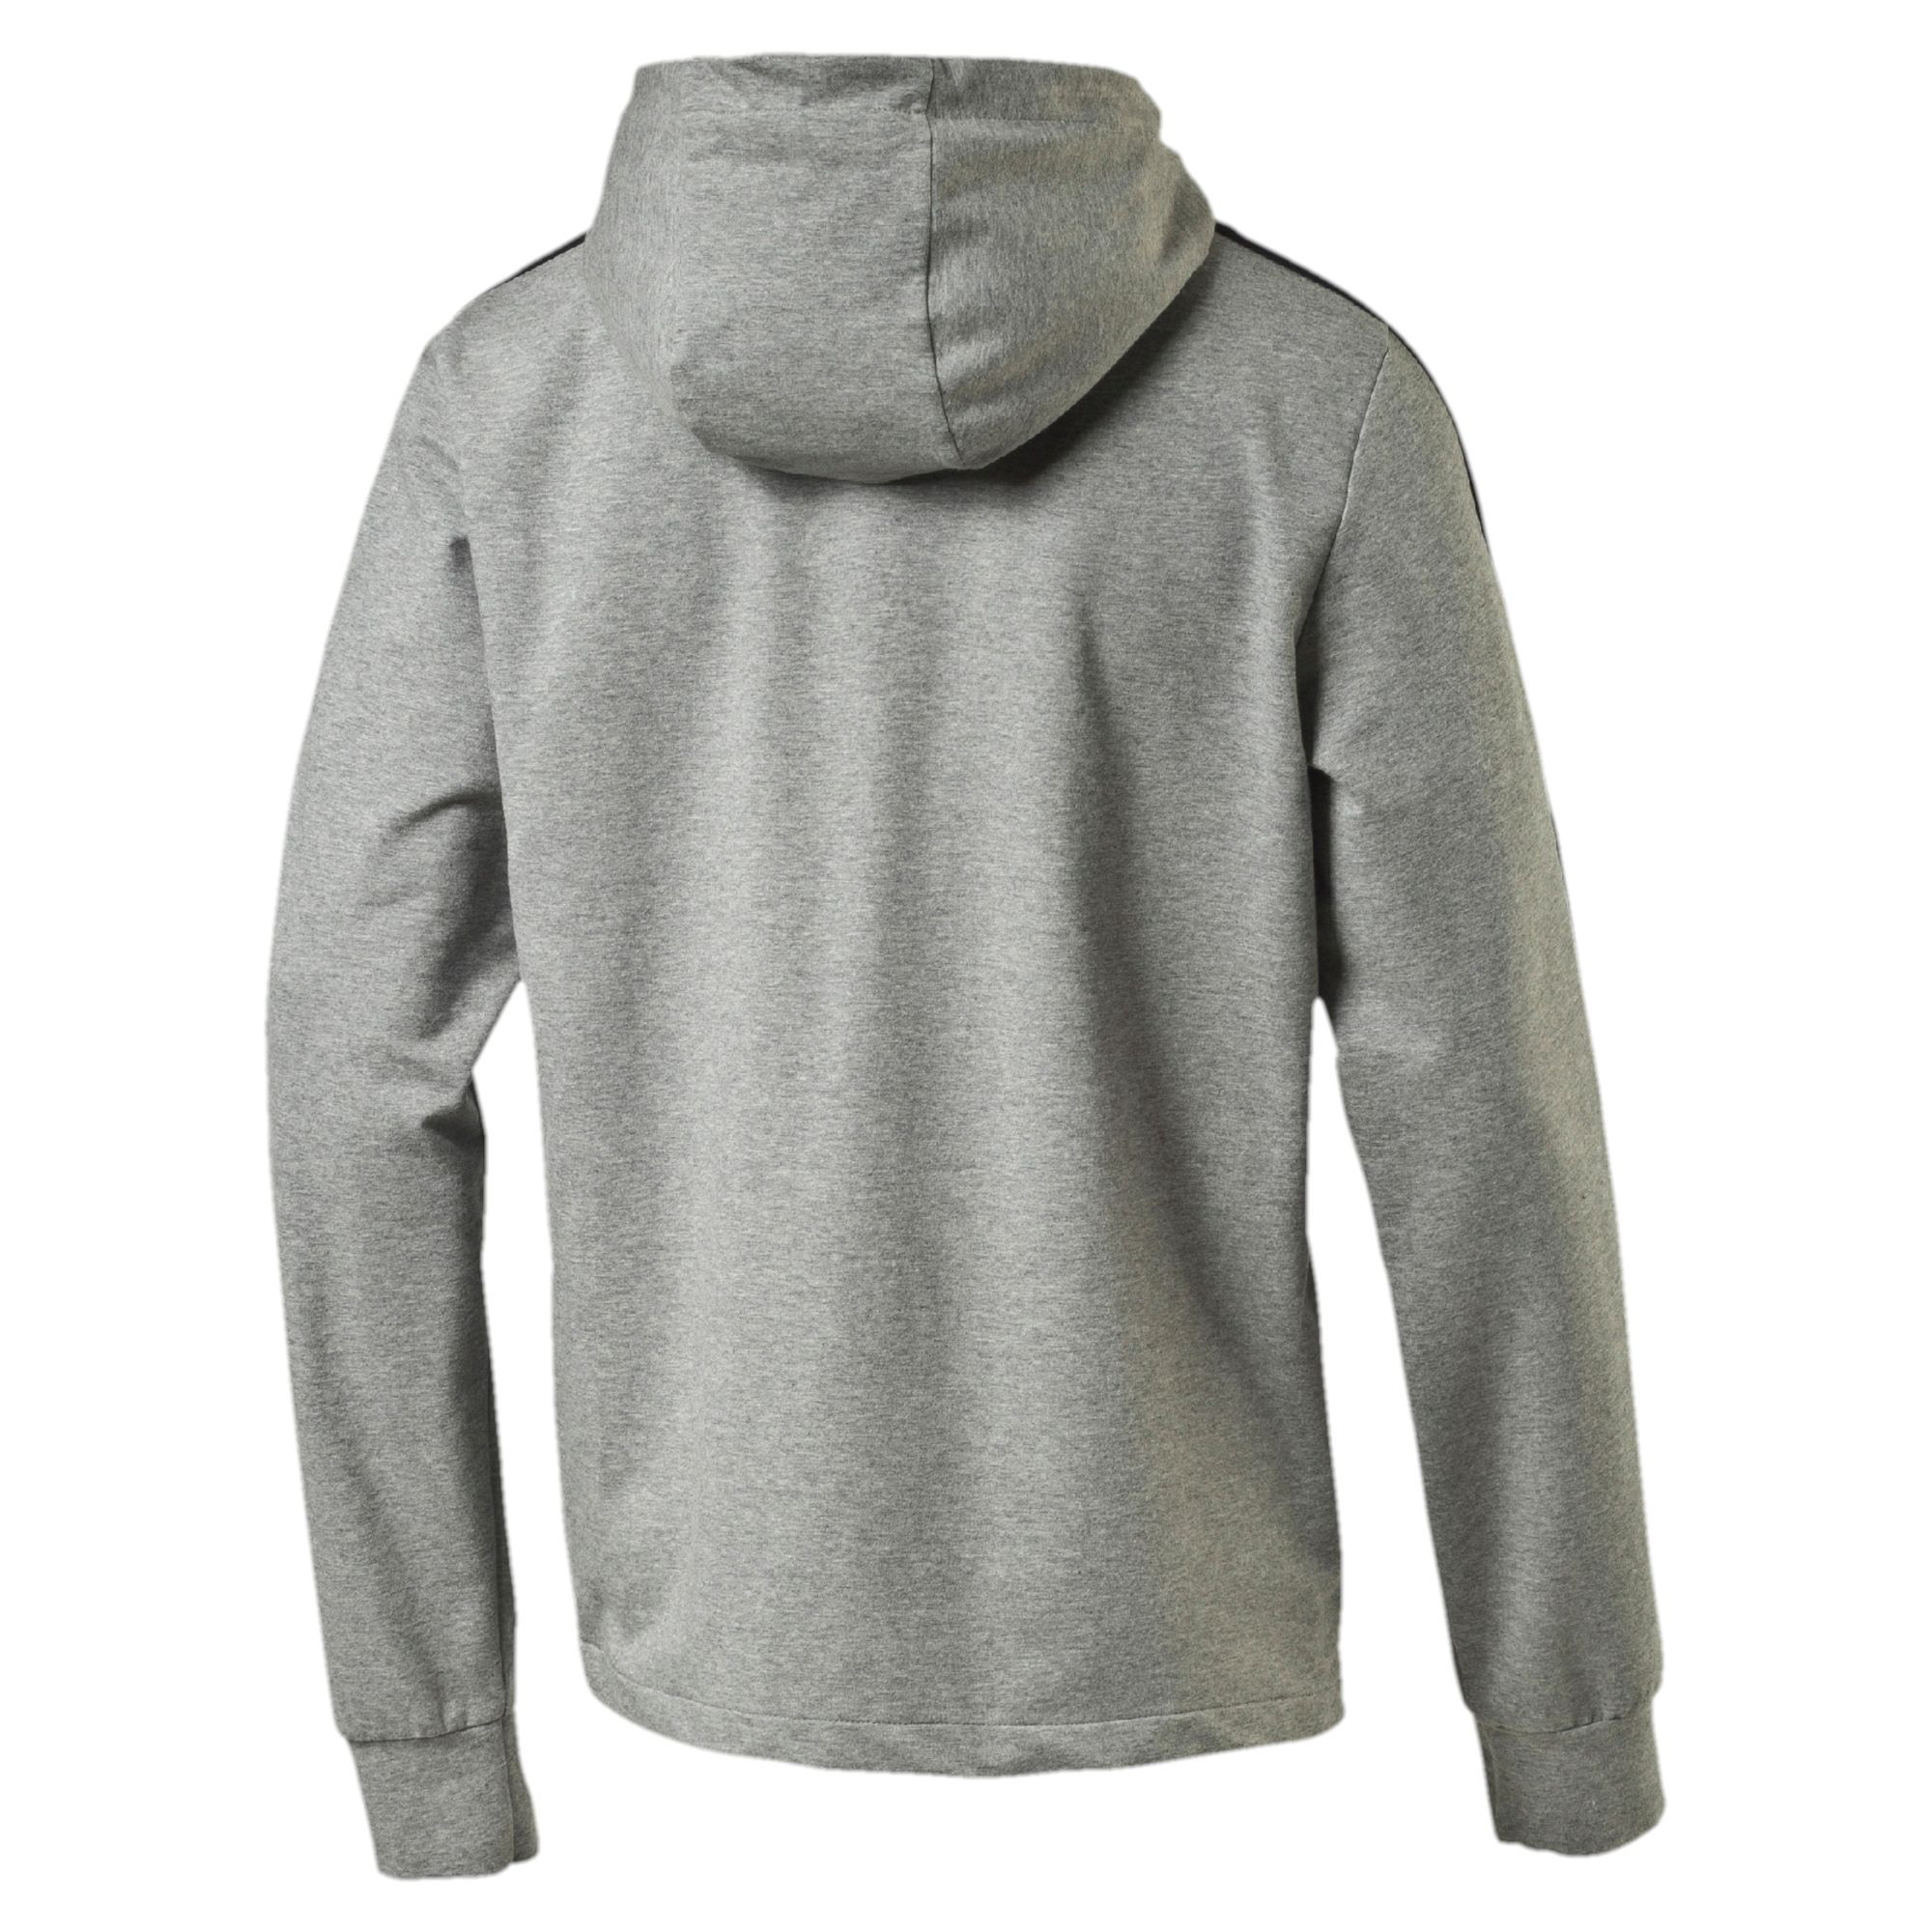 PUMA-StretchLite-Zip-Up-Hoodie-Men-Sweat-Basics thumbnail 5